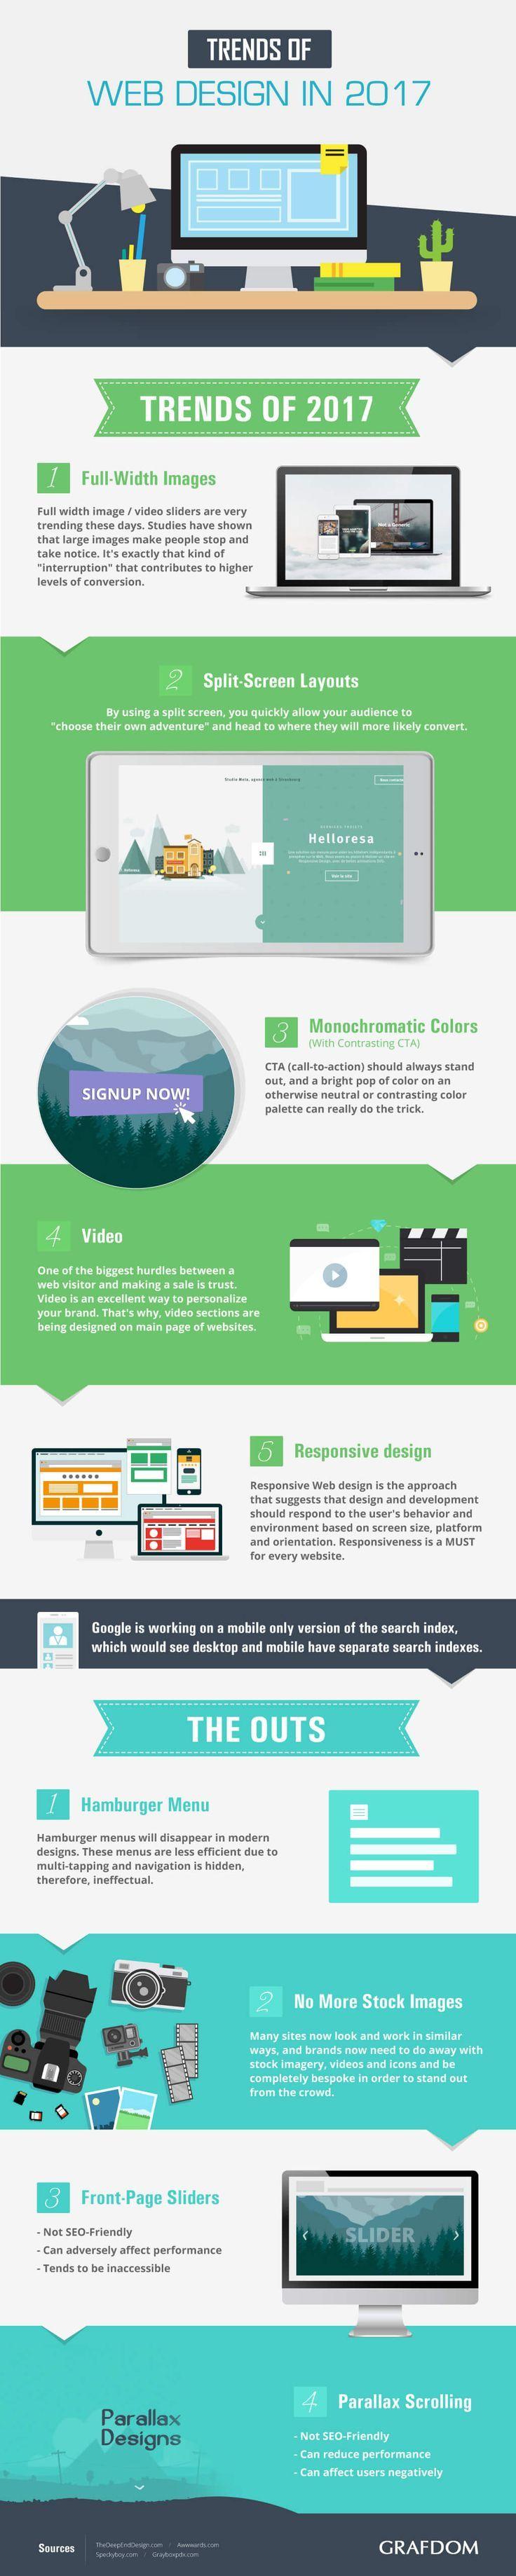 Top 5 Best Practices For Online Shopping Websites With Images Website Design Trends Web Design Web Design Trends